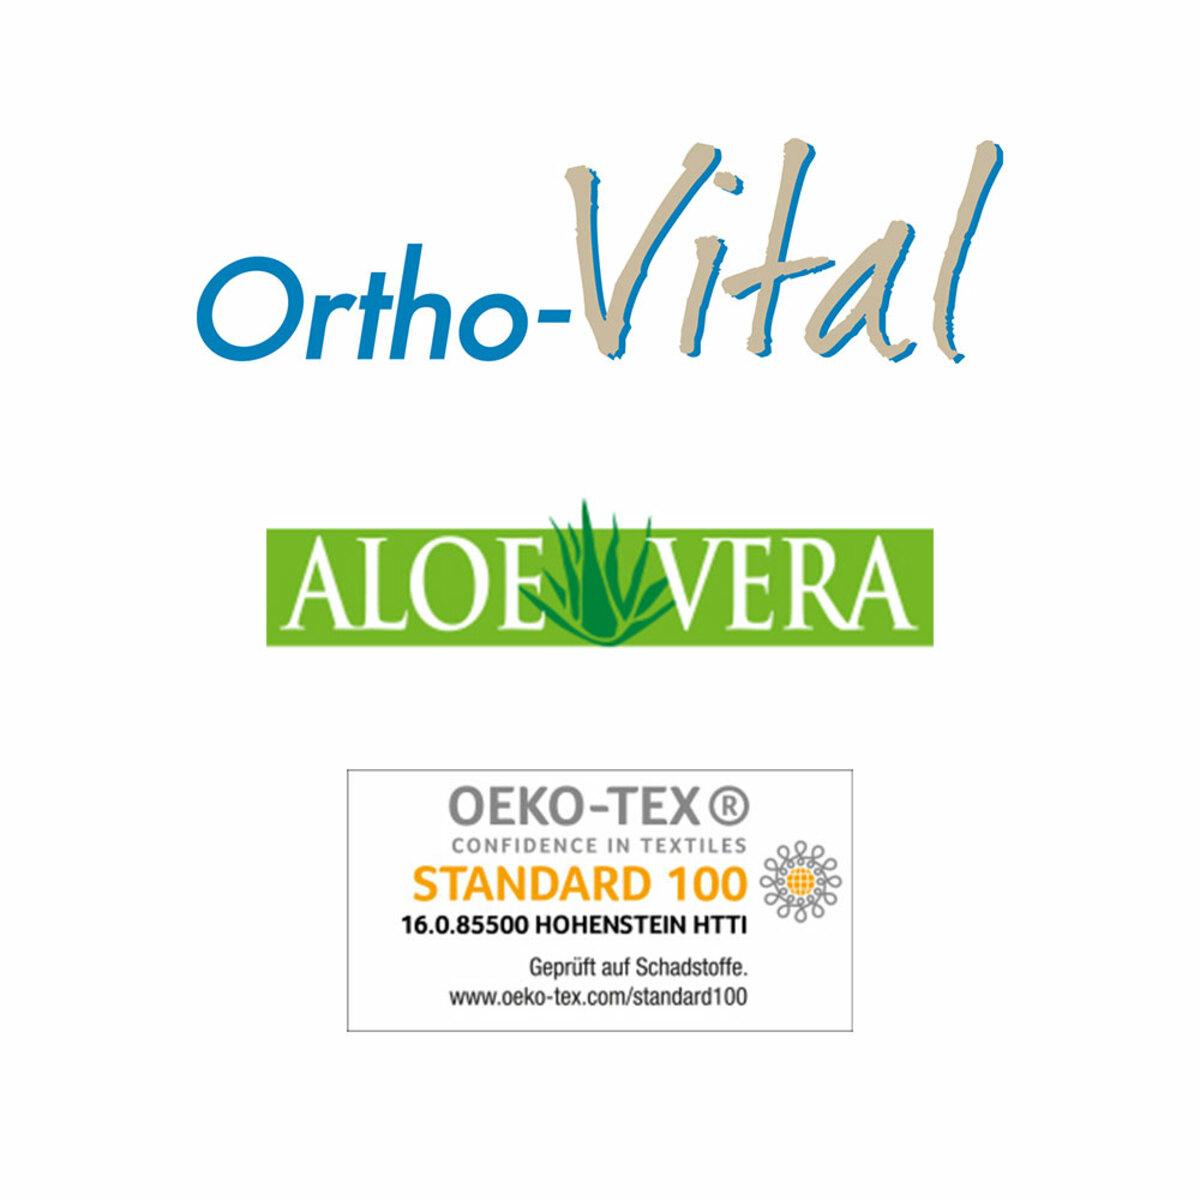 Bild 2 von Ortho-Vital Nackenstützkissen mit Aloe Vera